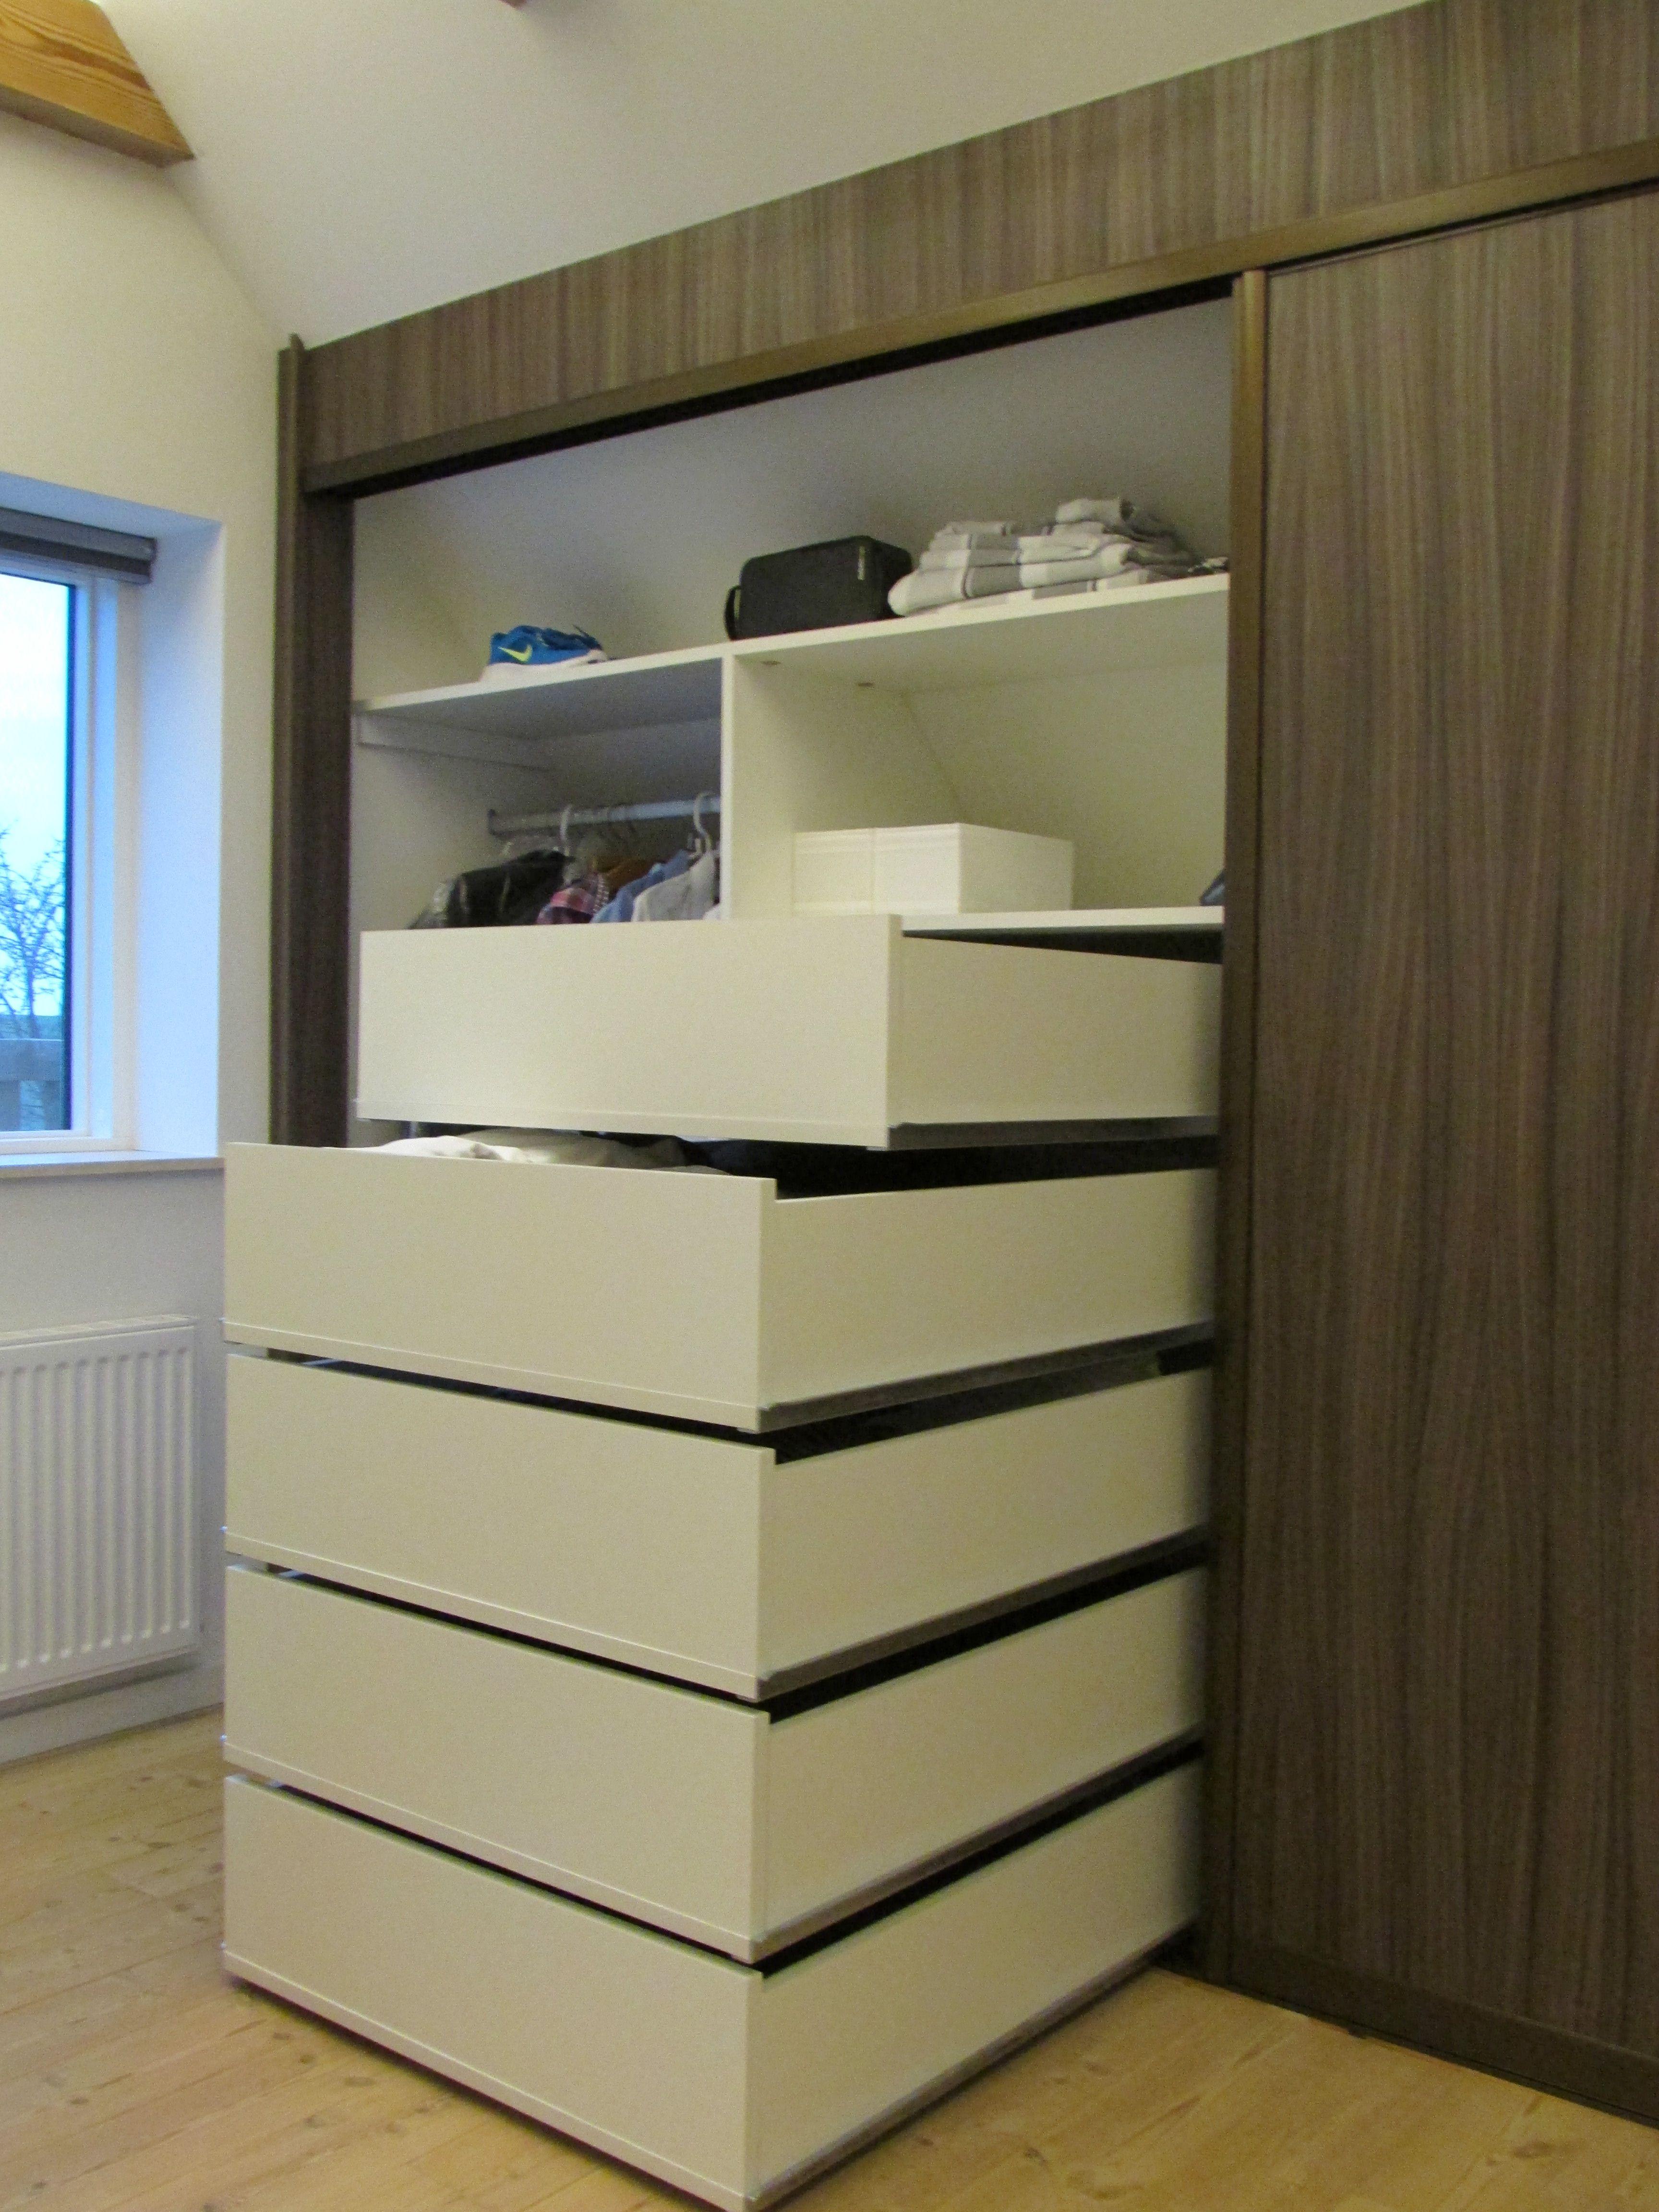 skunk garderobe garderobe inspirasjon pinterest wardrobes. Black Bedroom Furniture Sets. Home Design Ideas